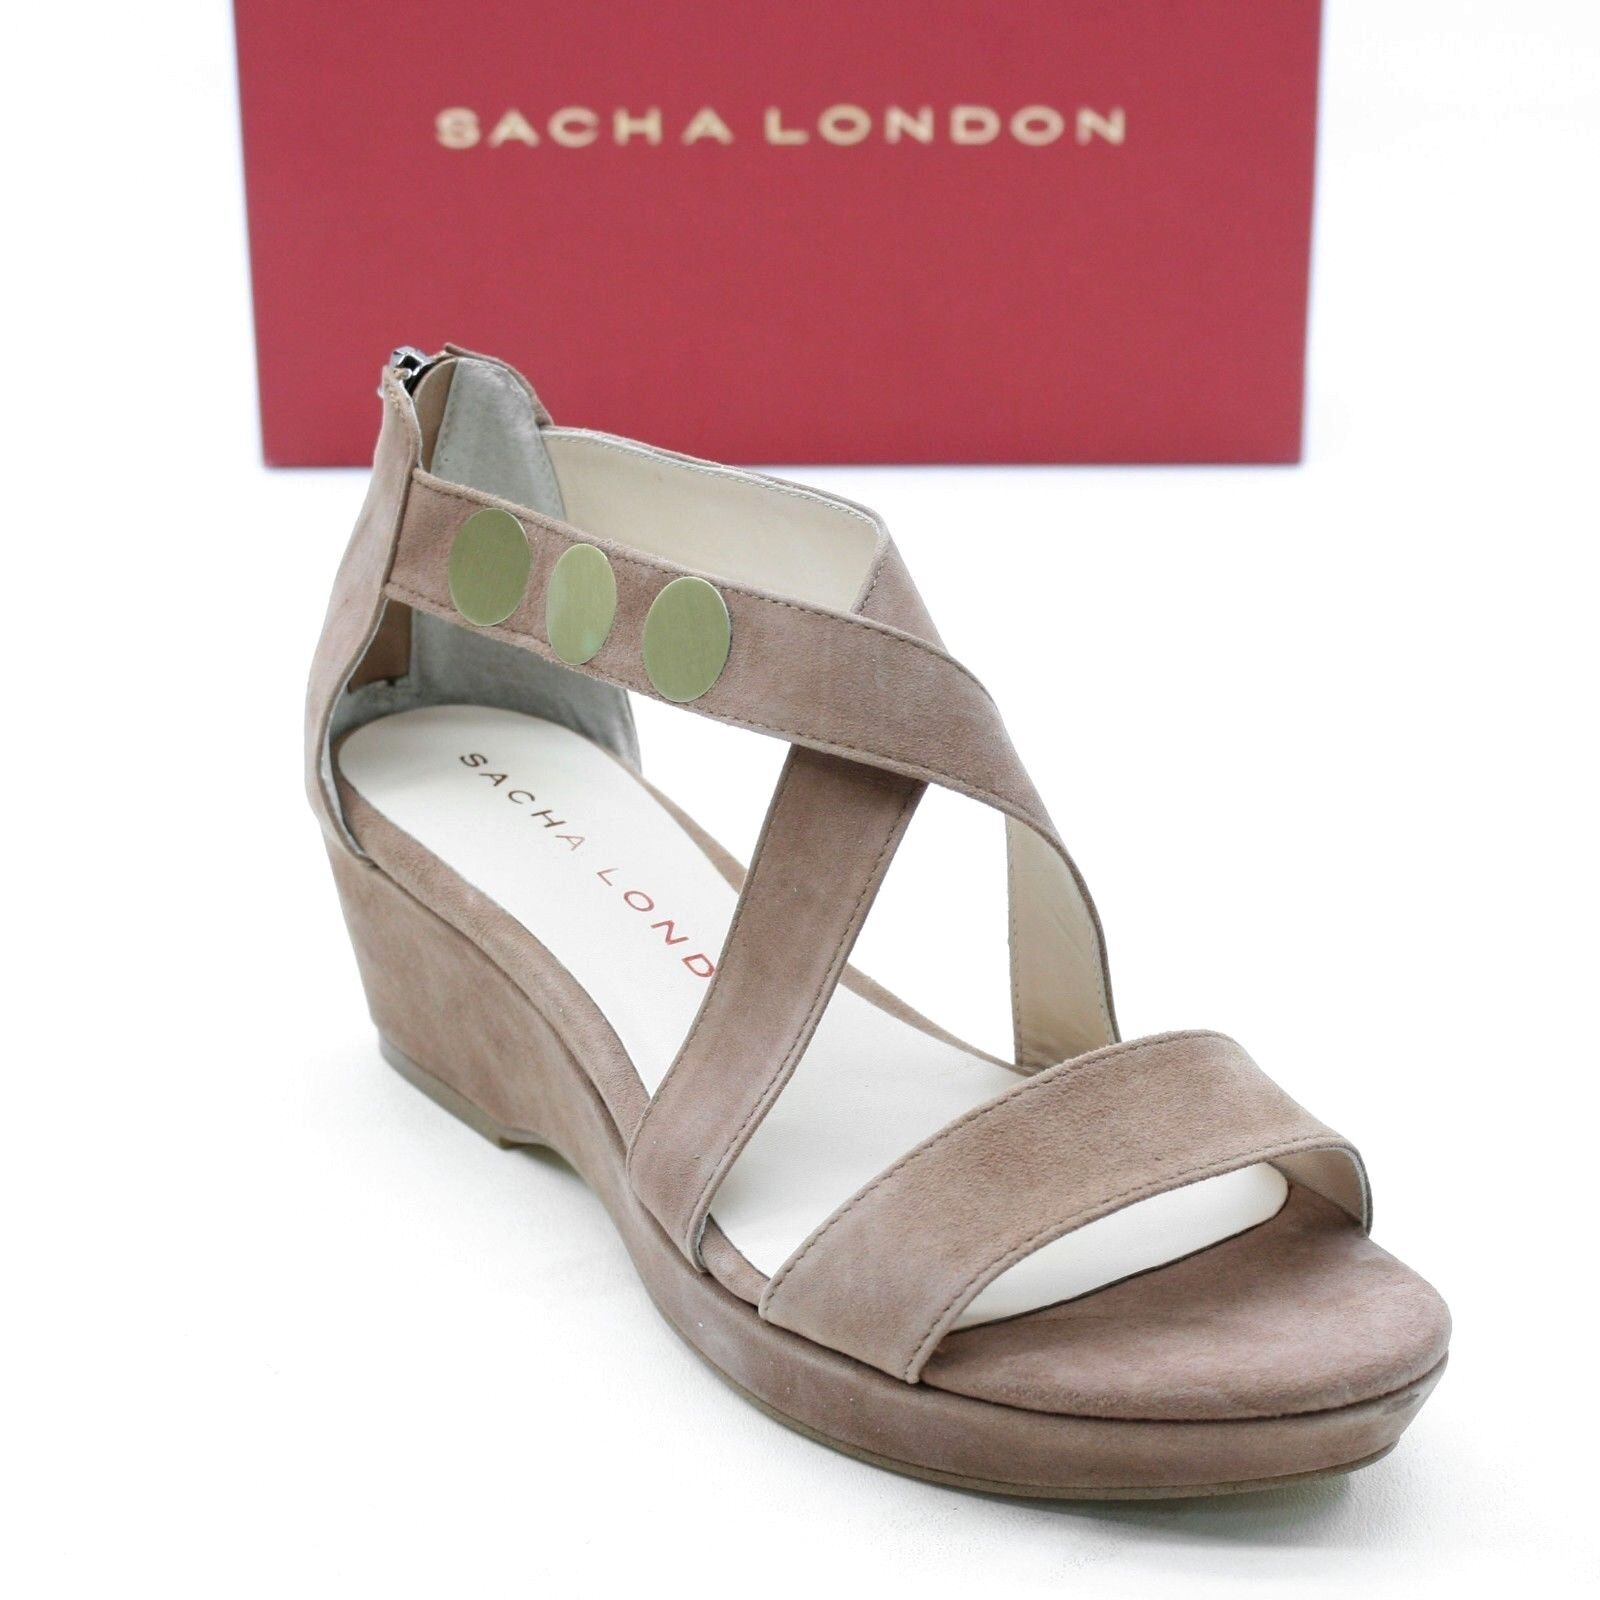 Sacha London Ladies 10 Gina Tan Taupe Kid Suede Nubuck Platform Sandals Back Zip